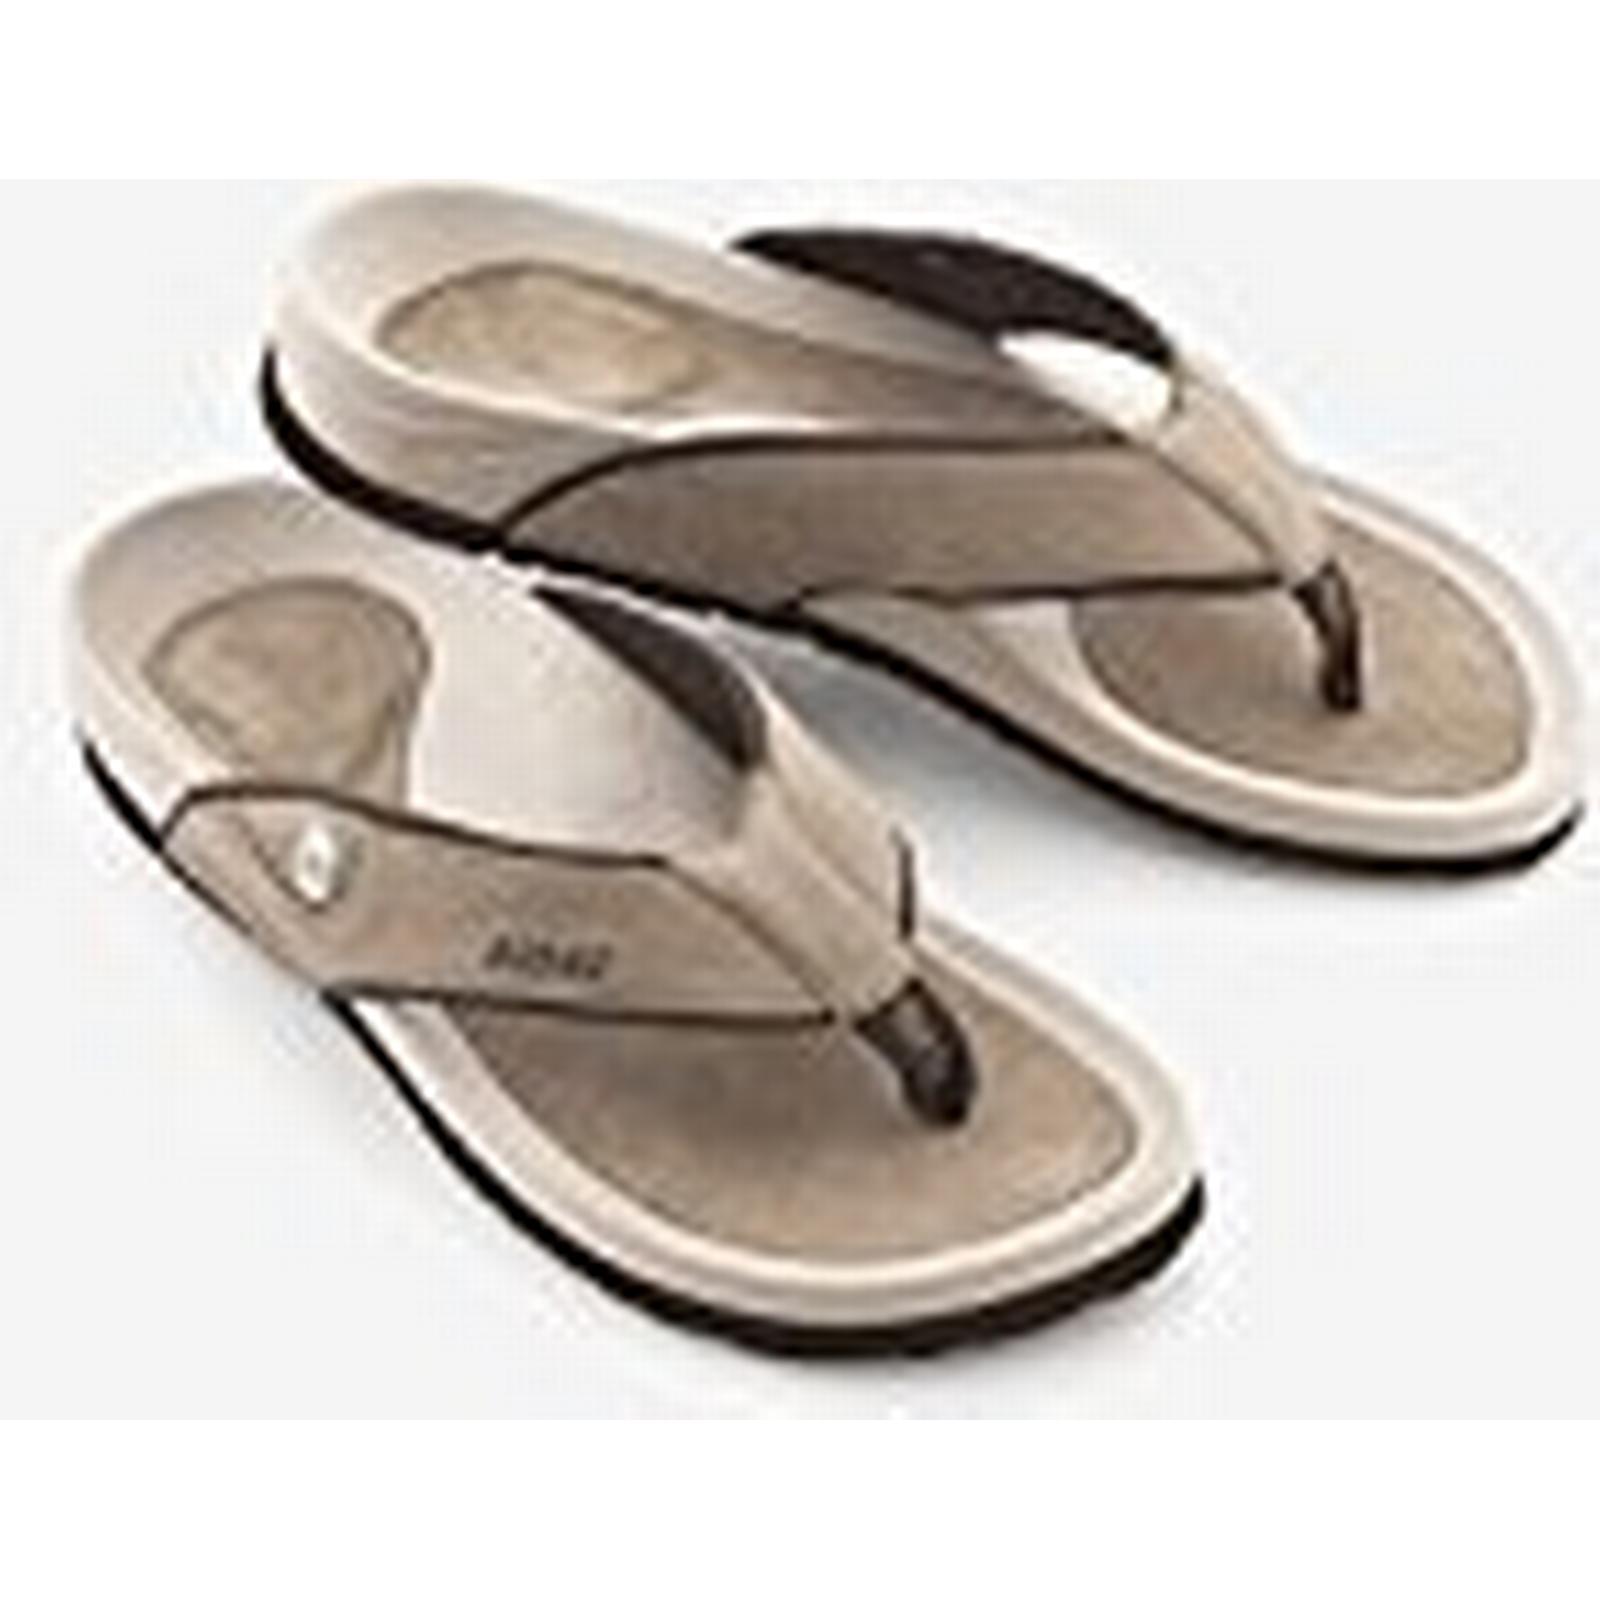 Sidas Coolday, coolday Shoes Man, Mens, Coolday, Sidas Dune, Taille 46 46c368